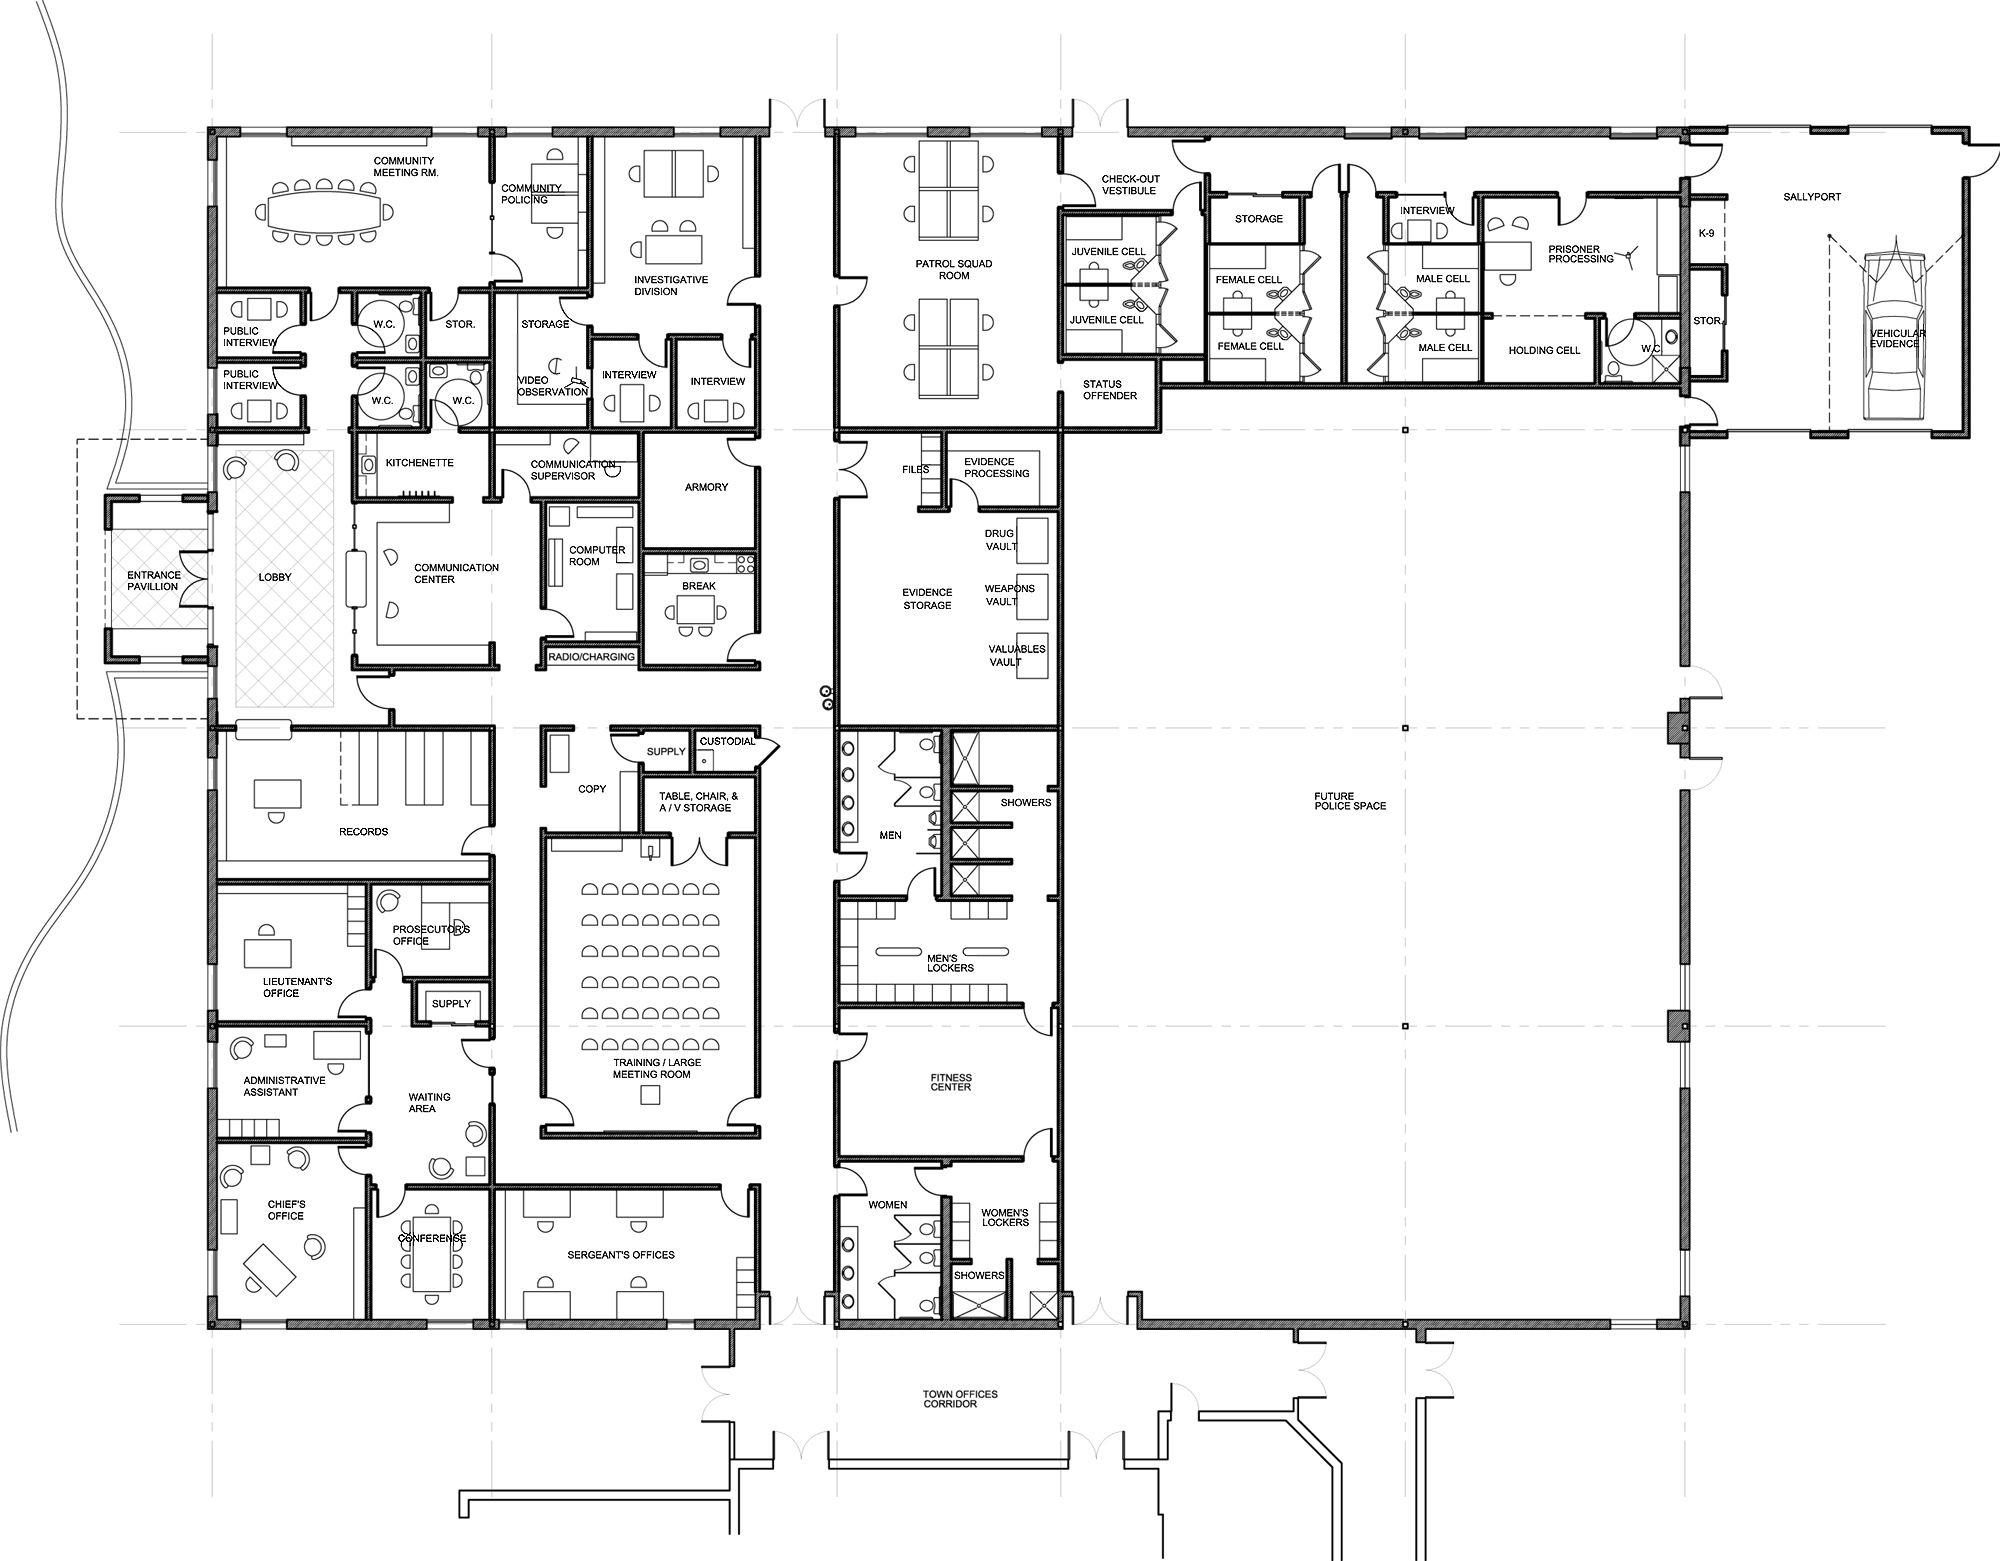 Astonishing Floor Plans Blueprints On Floor With Home